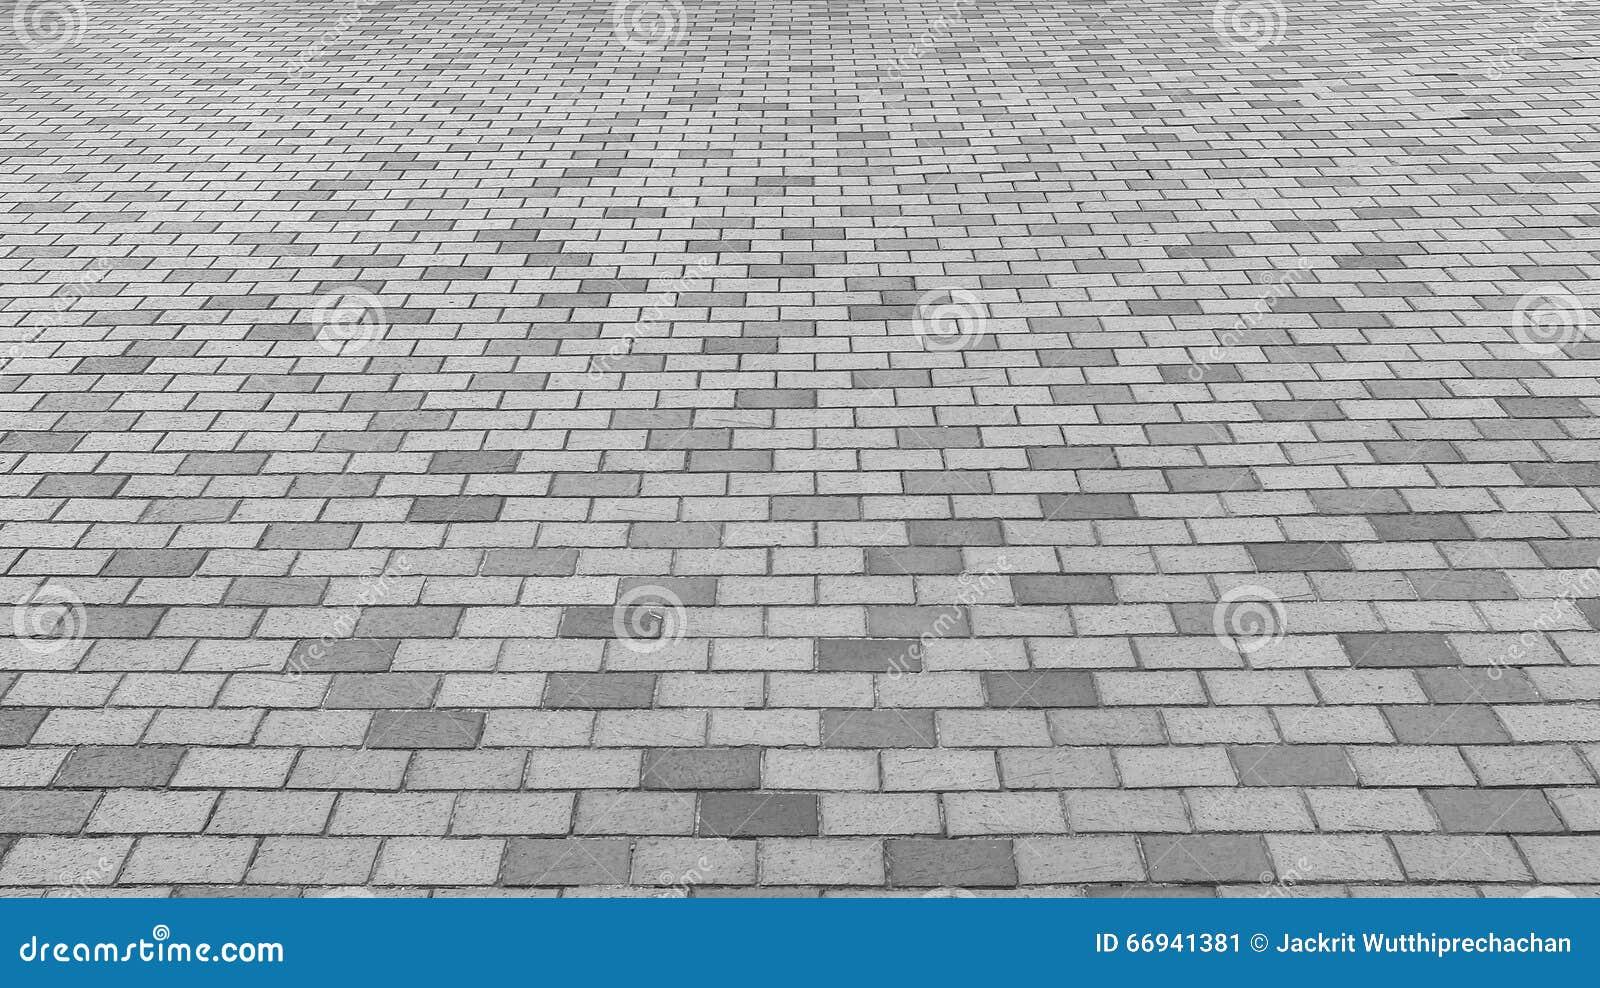 Perspective View of Monotone Gray Brick Stone Street Road. Sidewalk, Pavement Texture